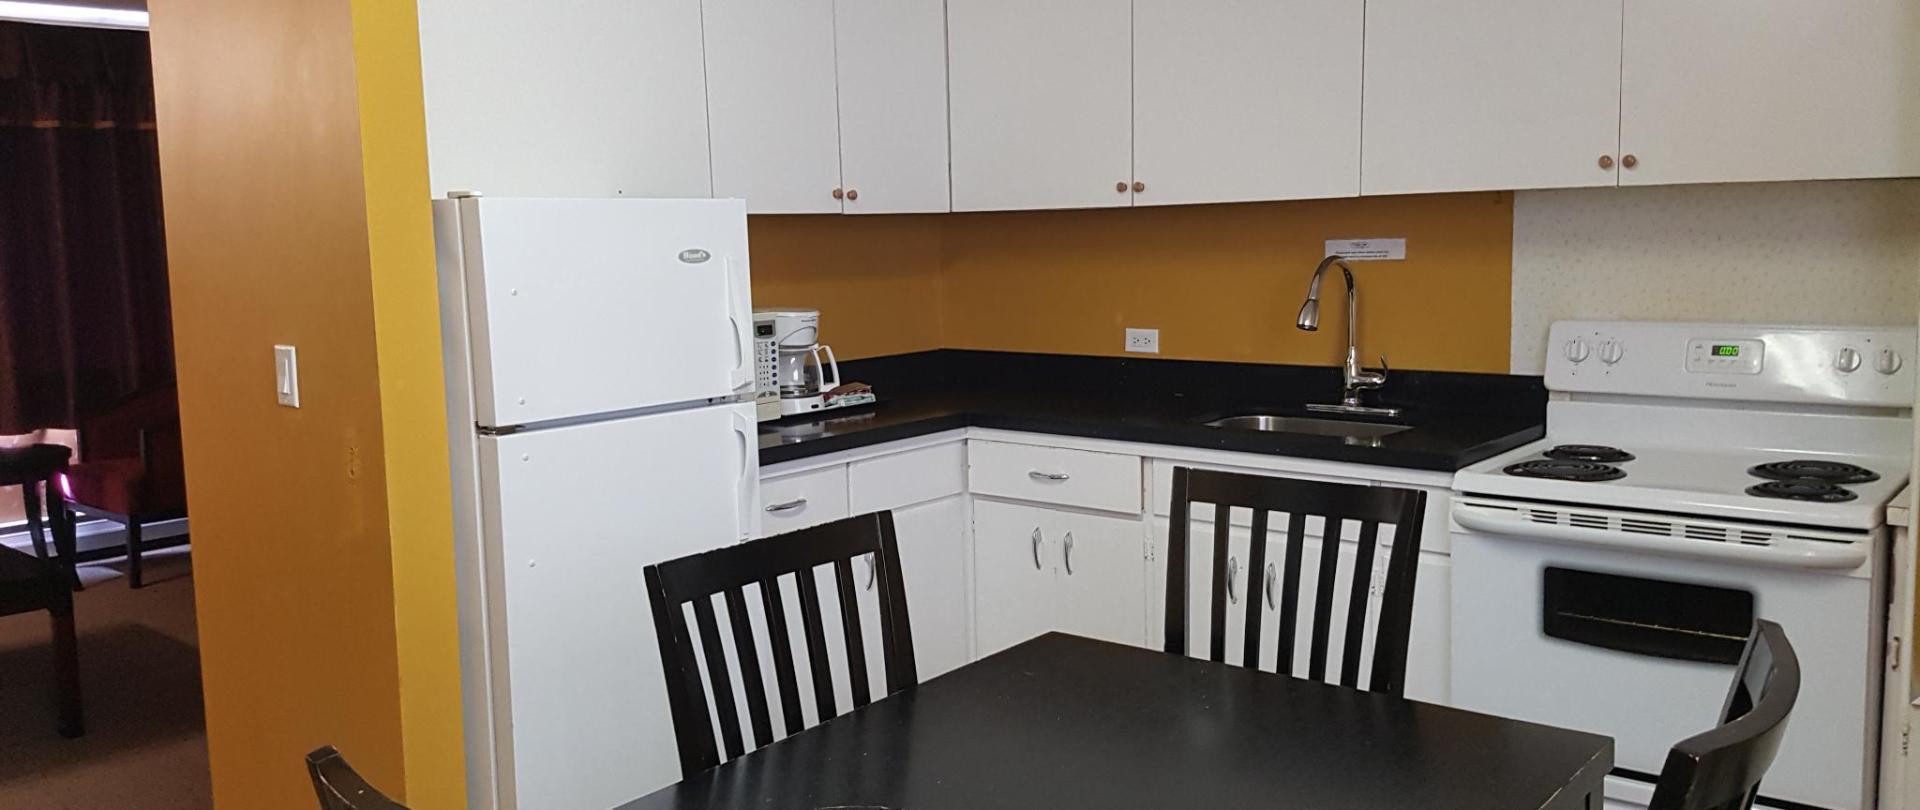 Two Bedroom Kitchen Suite -- Full Kitchen.jpg